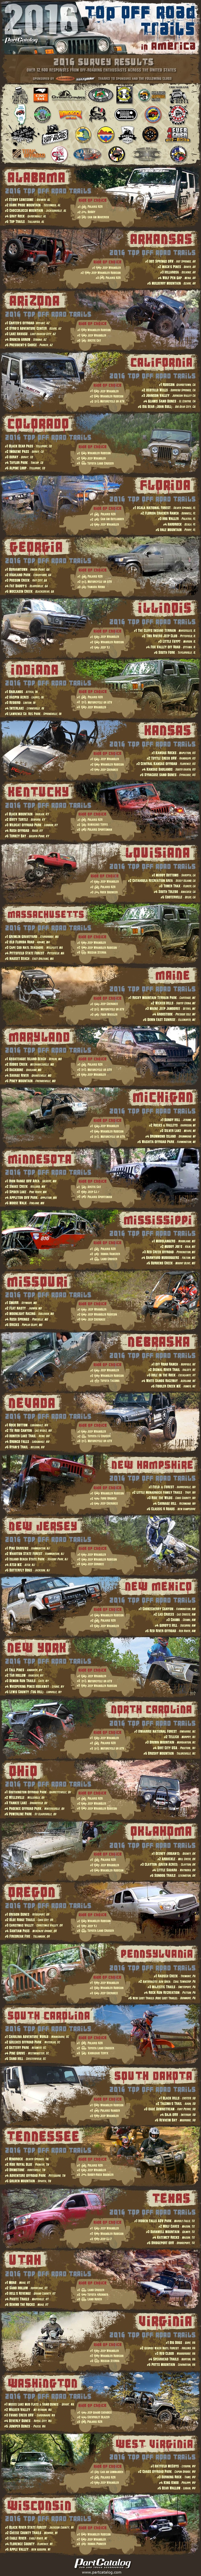 2016-top-offroad-trails-parks-in-america-fullq-1-min